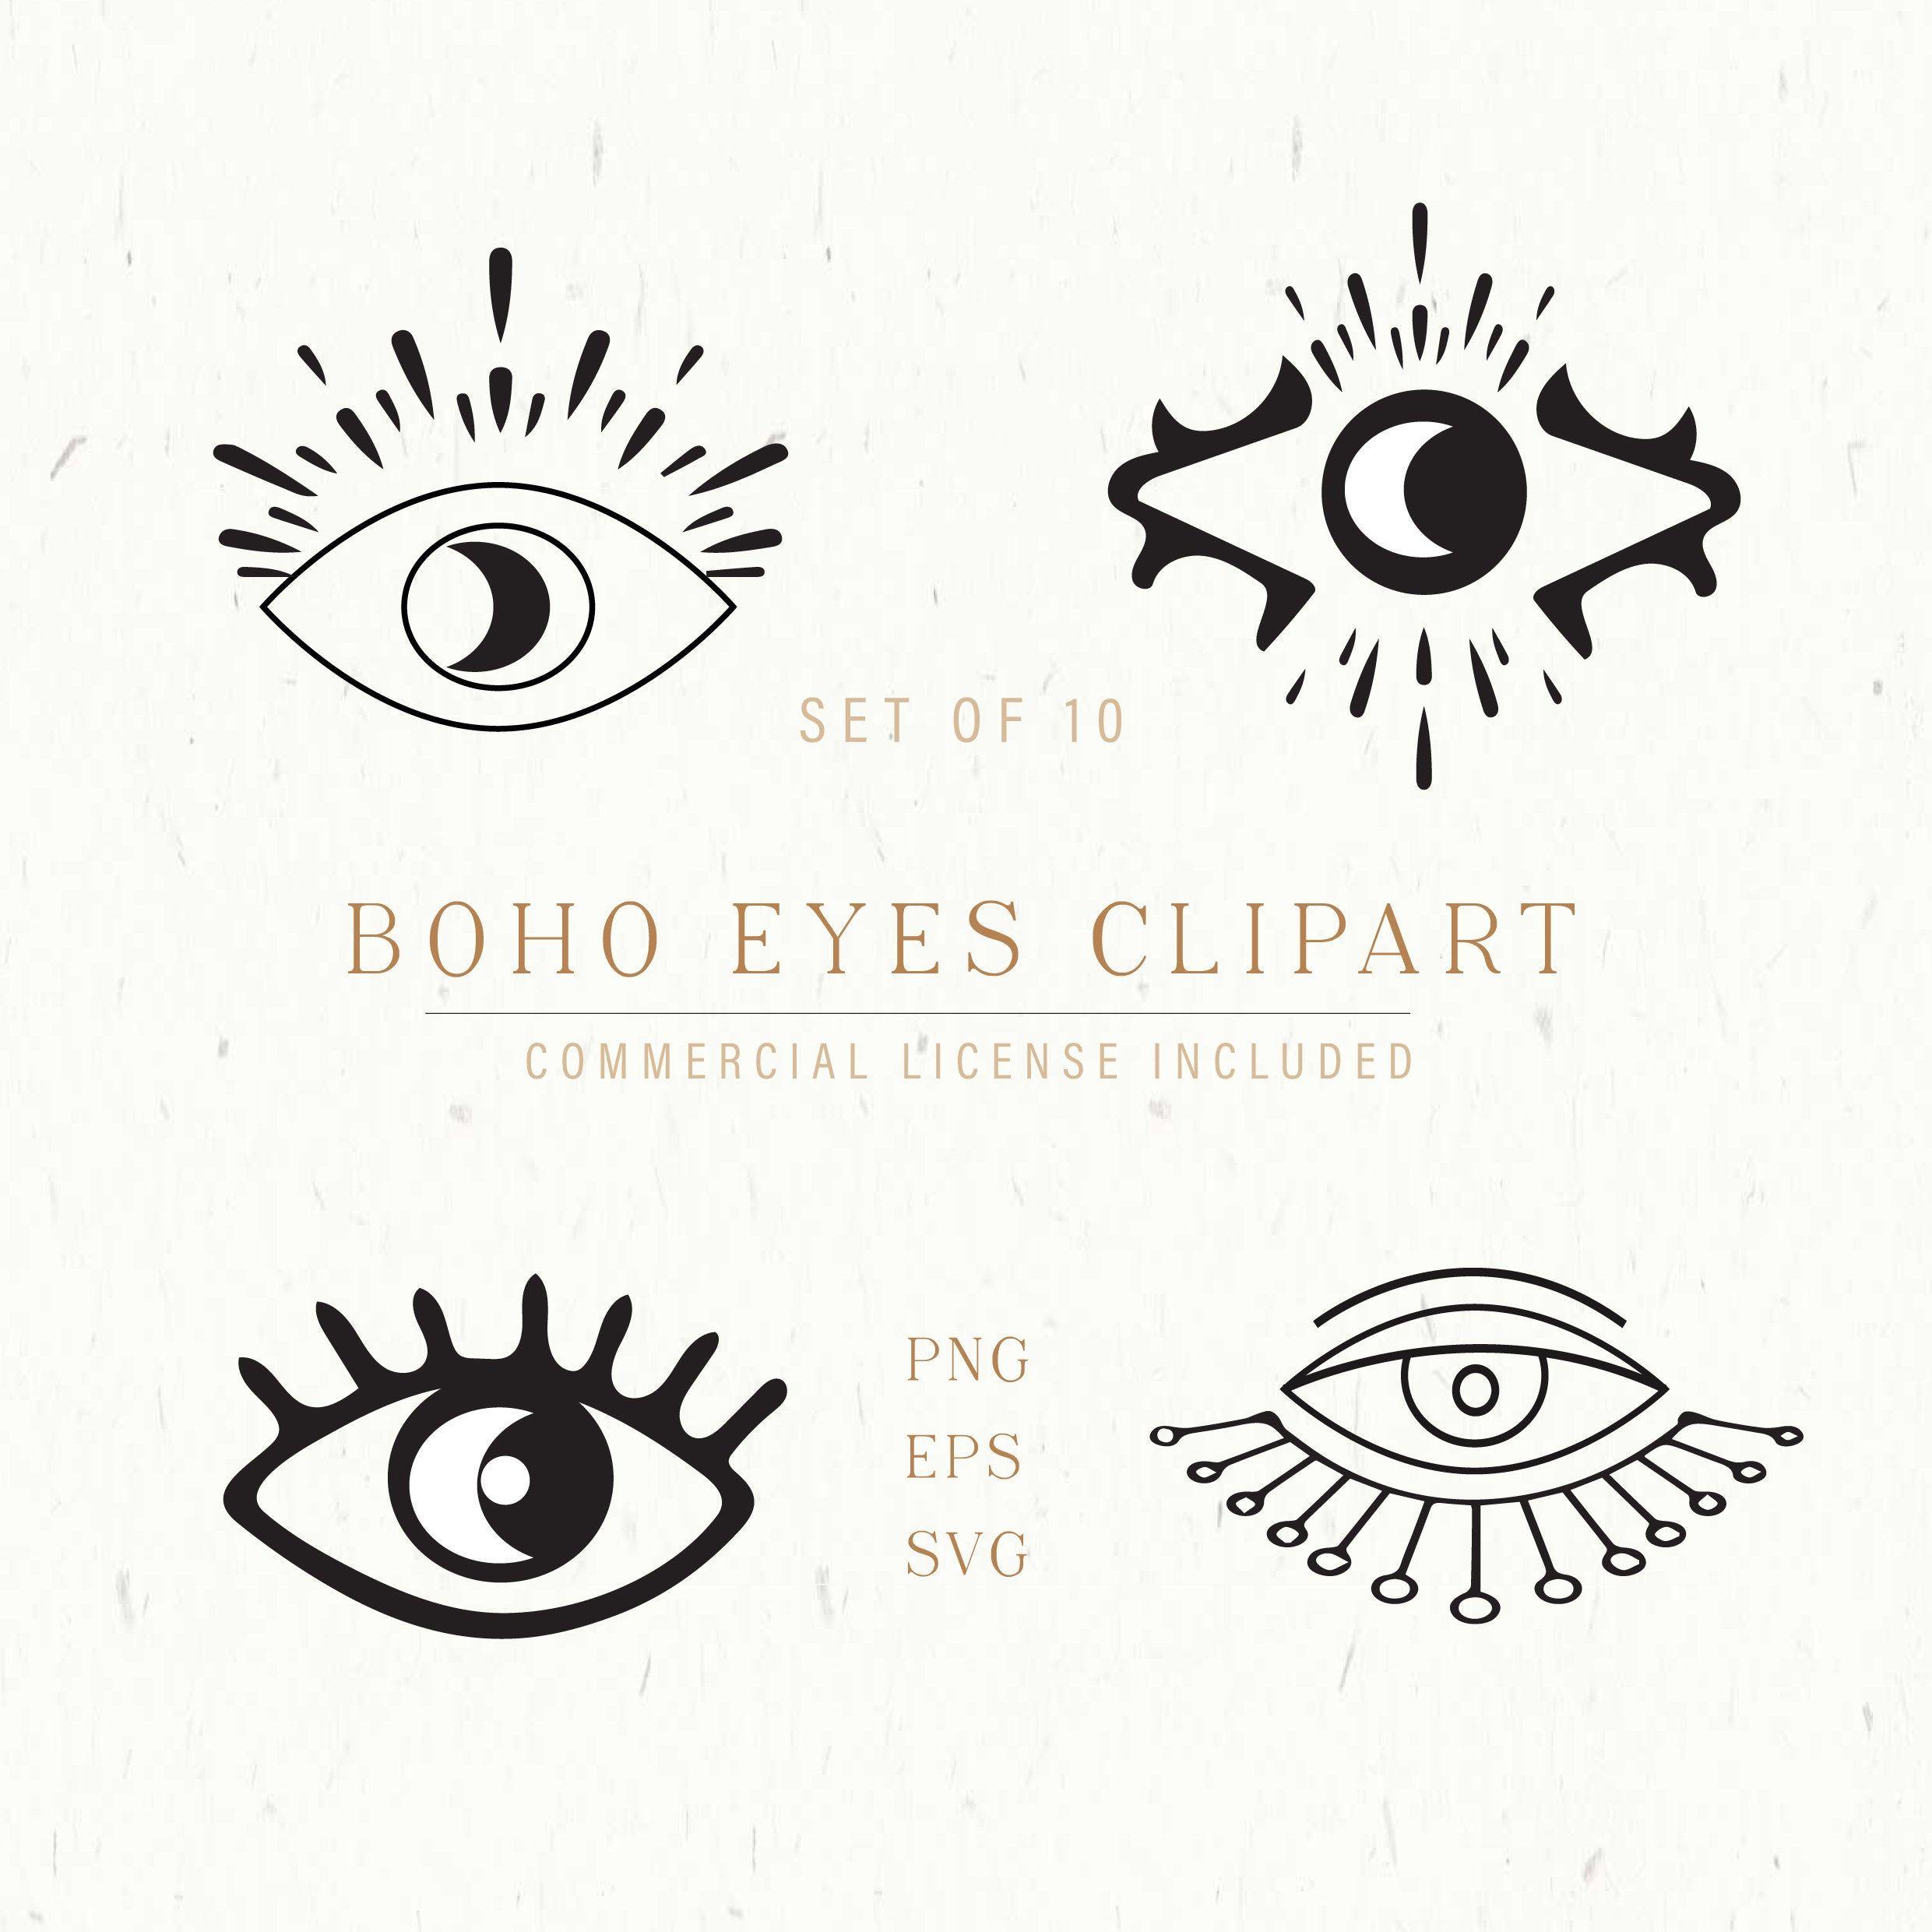 Boho Eyes Vector Clipart Eye Eye Svg Boho Eyes Design Third Etsy Clip Art Eye Design Make Your Own Logo